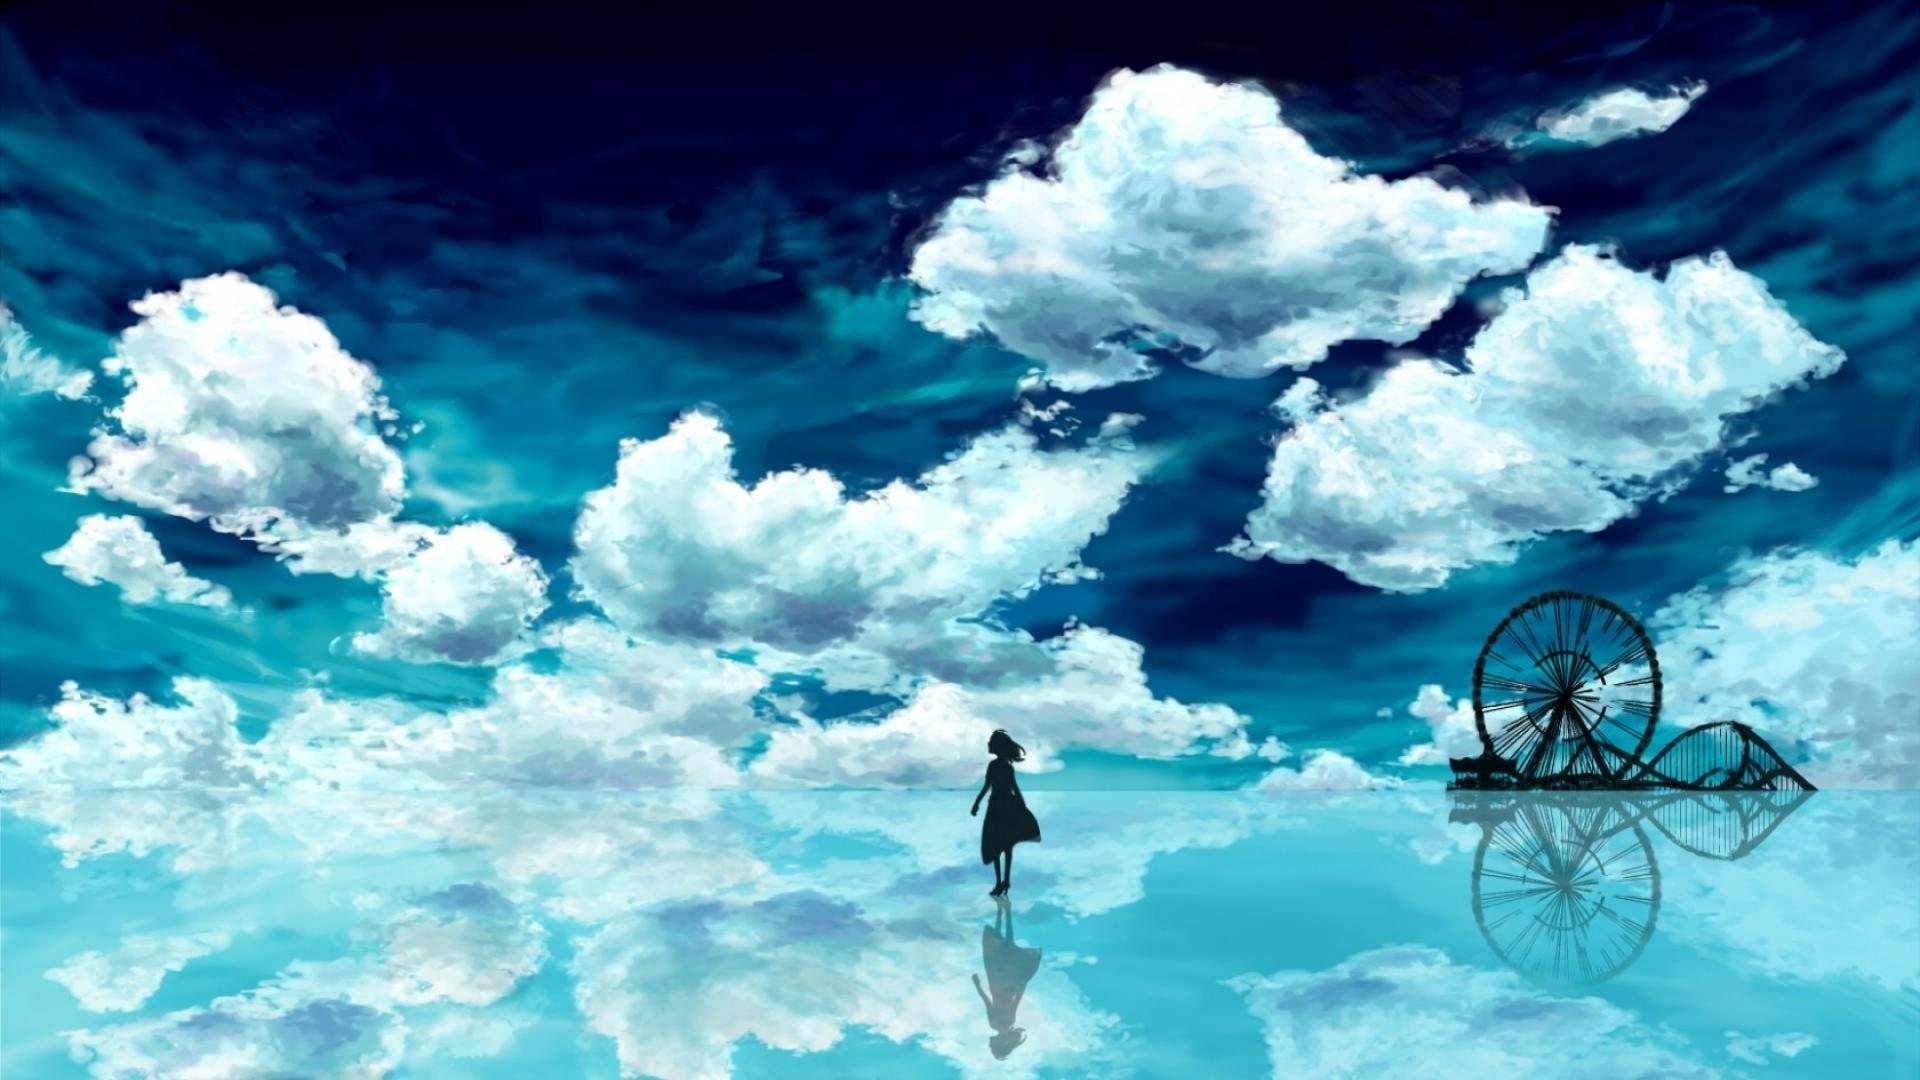 Anime – Sky Anime Wallpaper